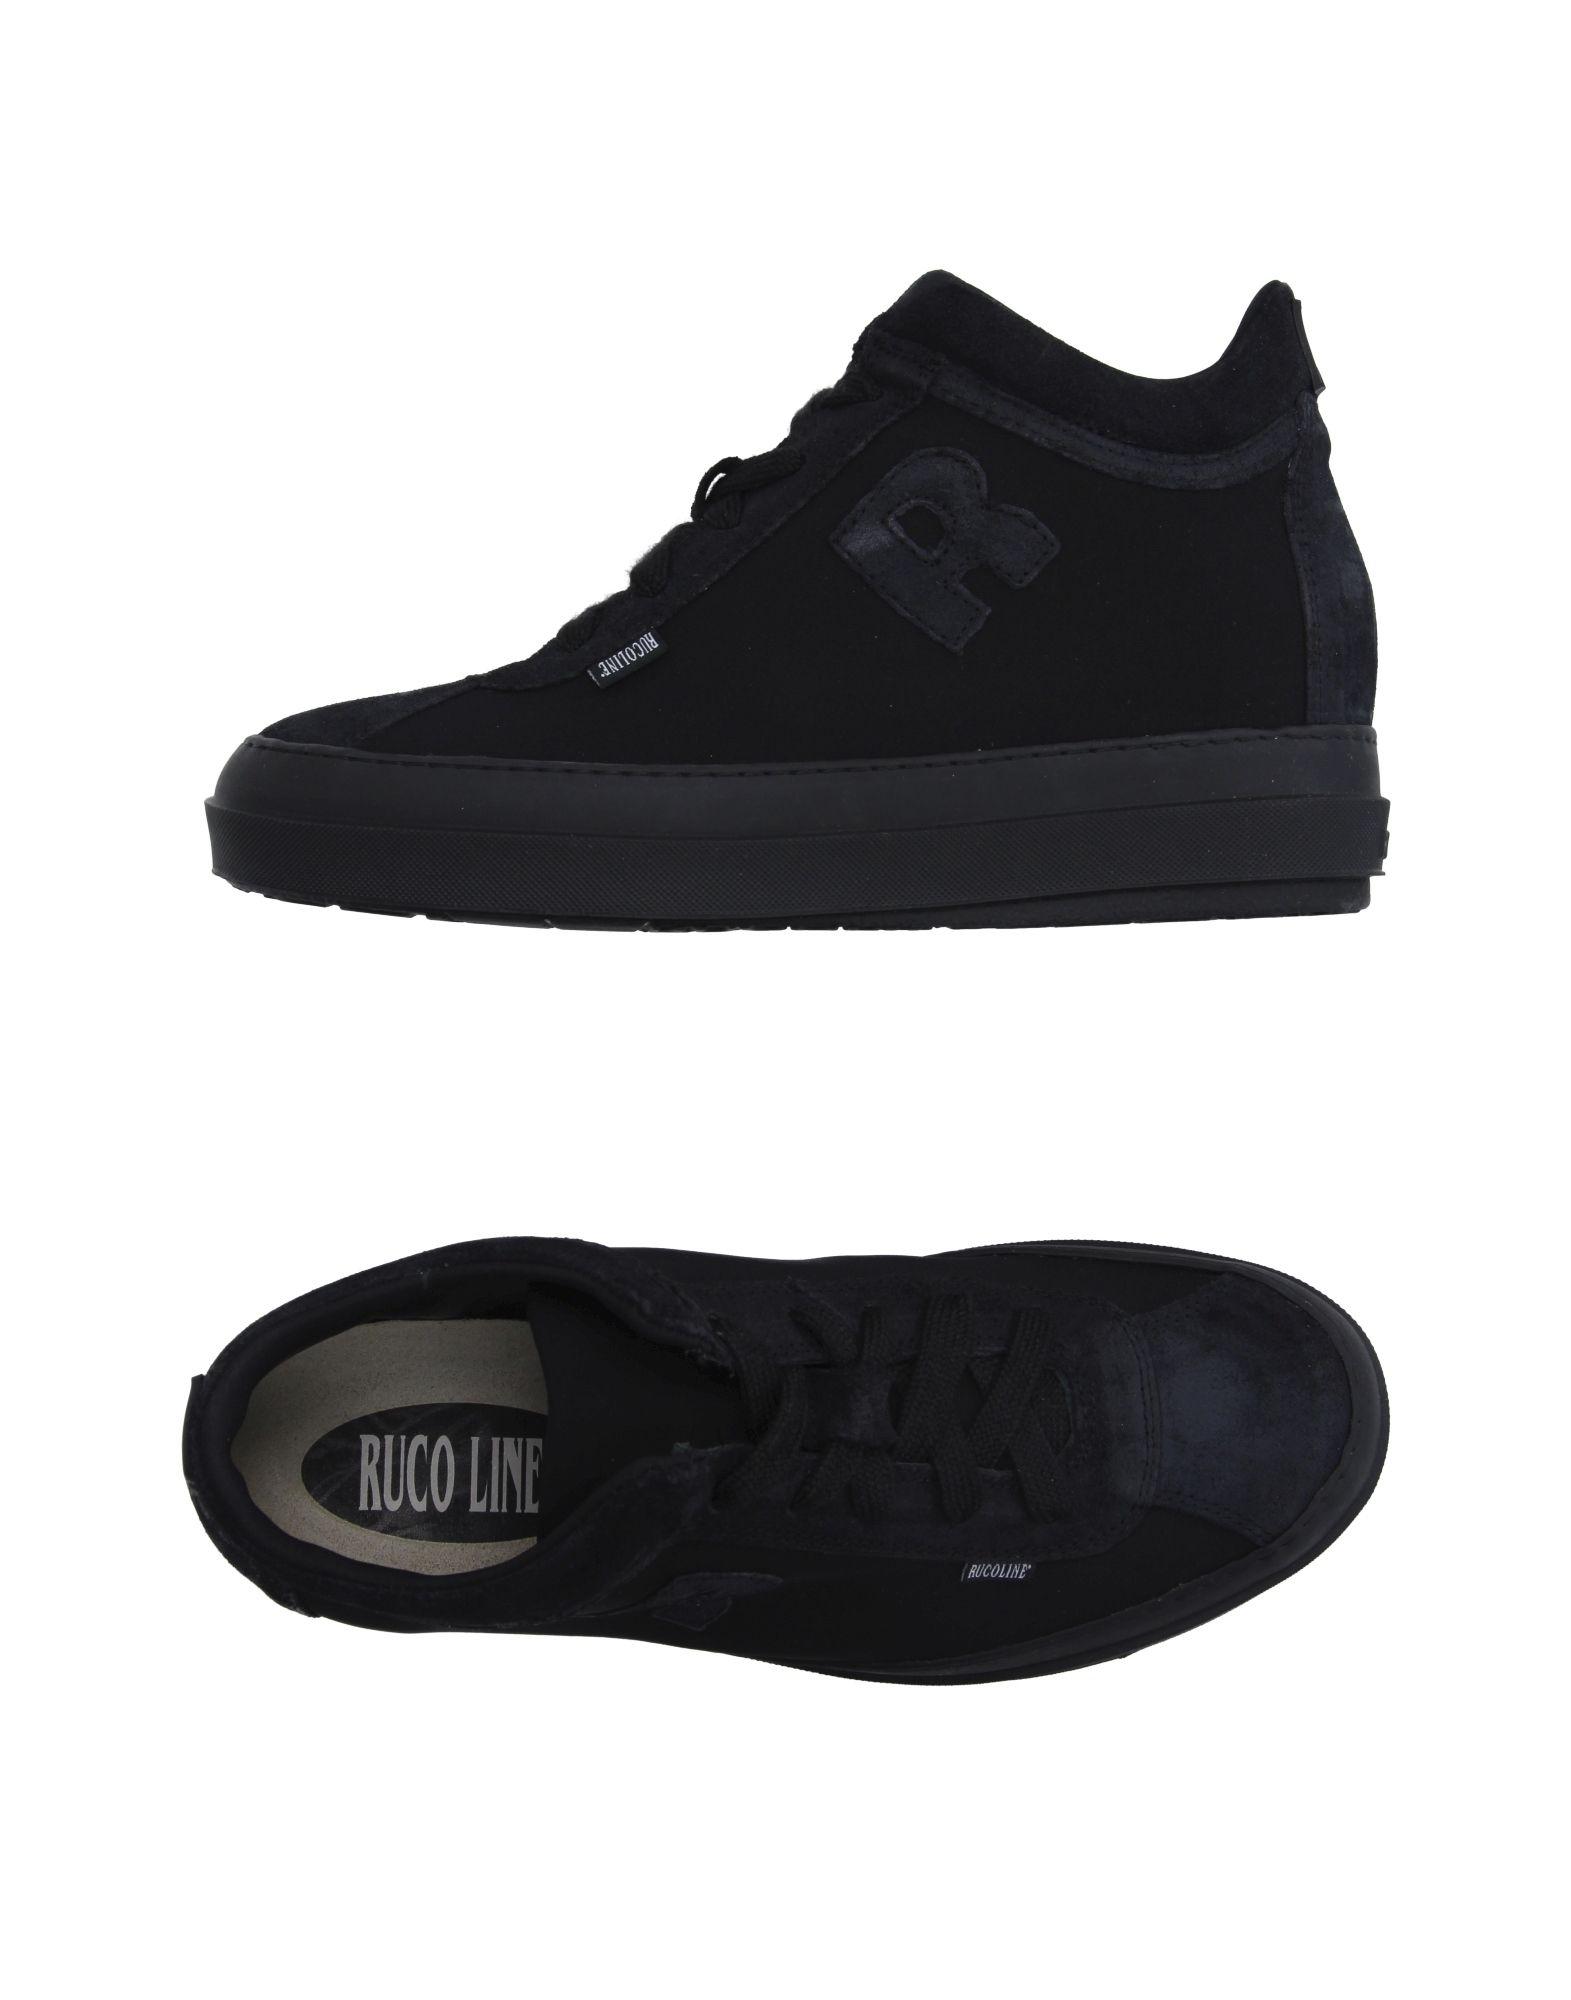 Stilvolle billige Sneakers Schuhe Ruco Line Sneakers billige Damen  44990969PG 0cbb5c